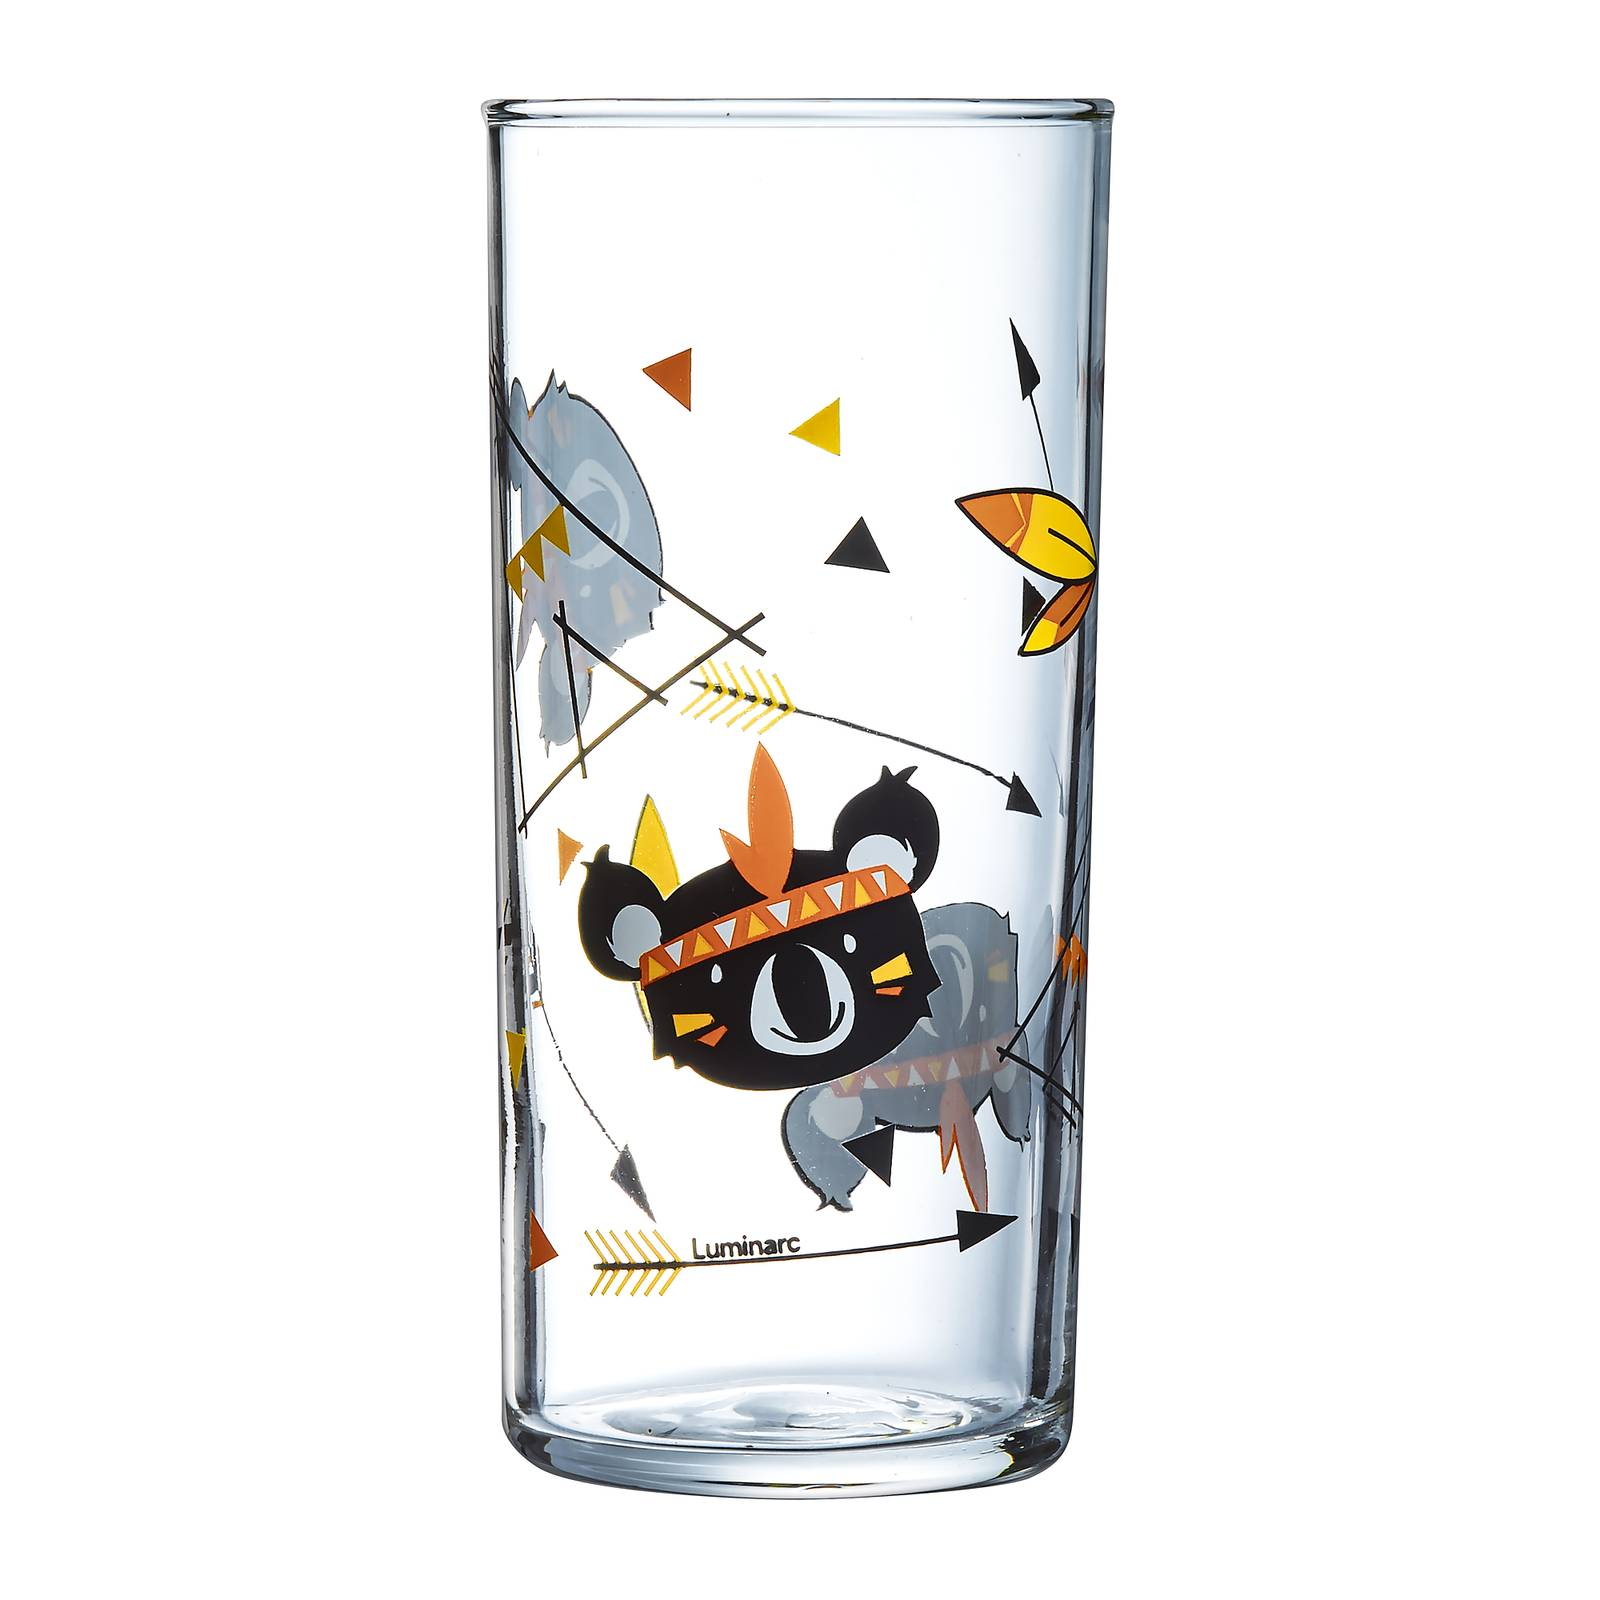 Szklanka wysoka Kotipi 300 ml LUMINARC